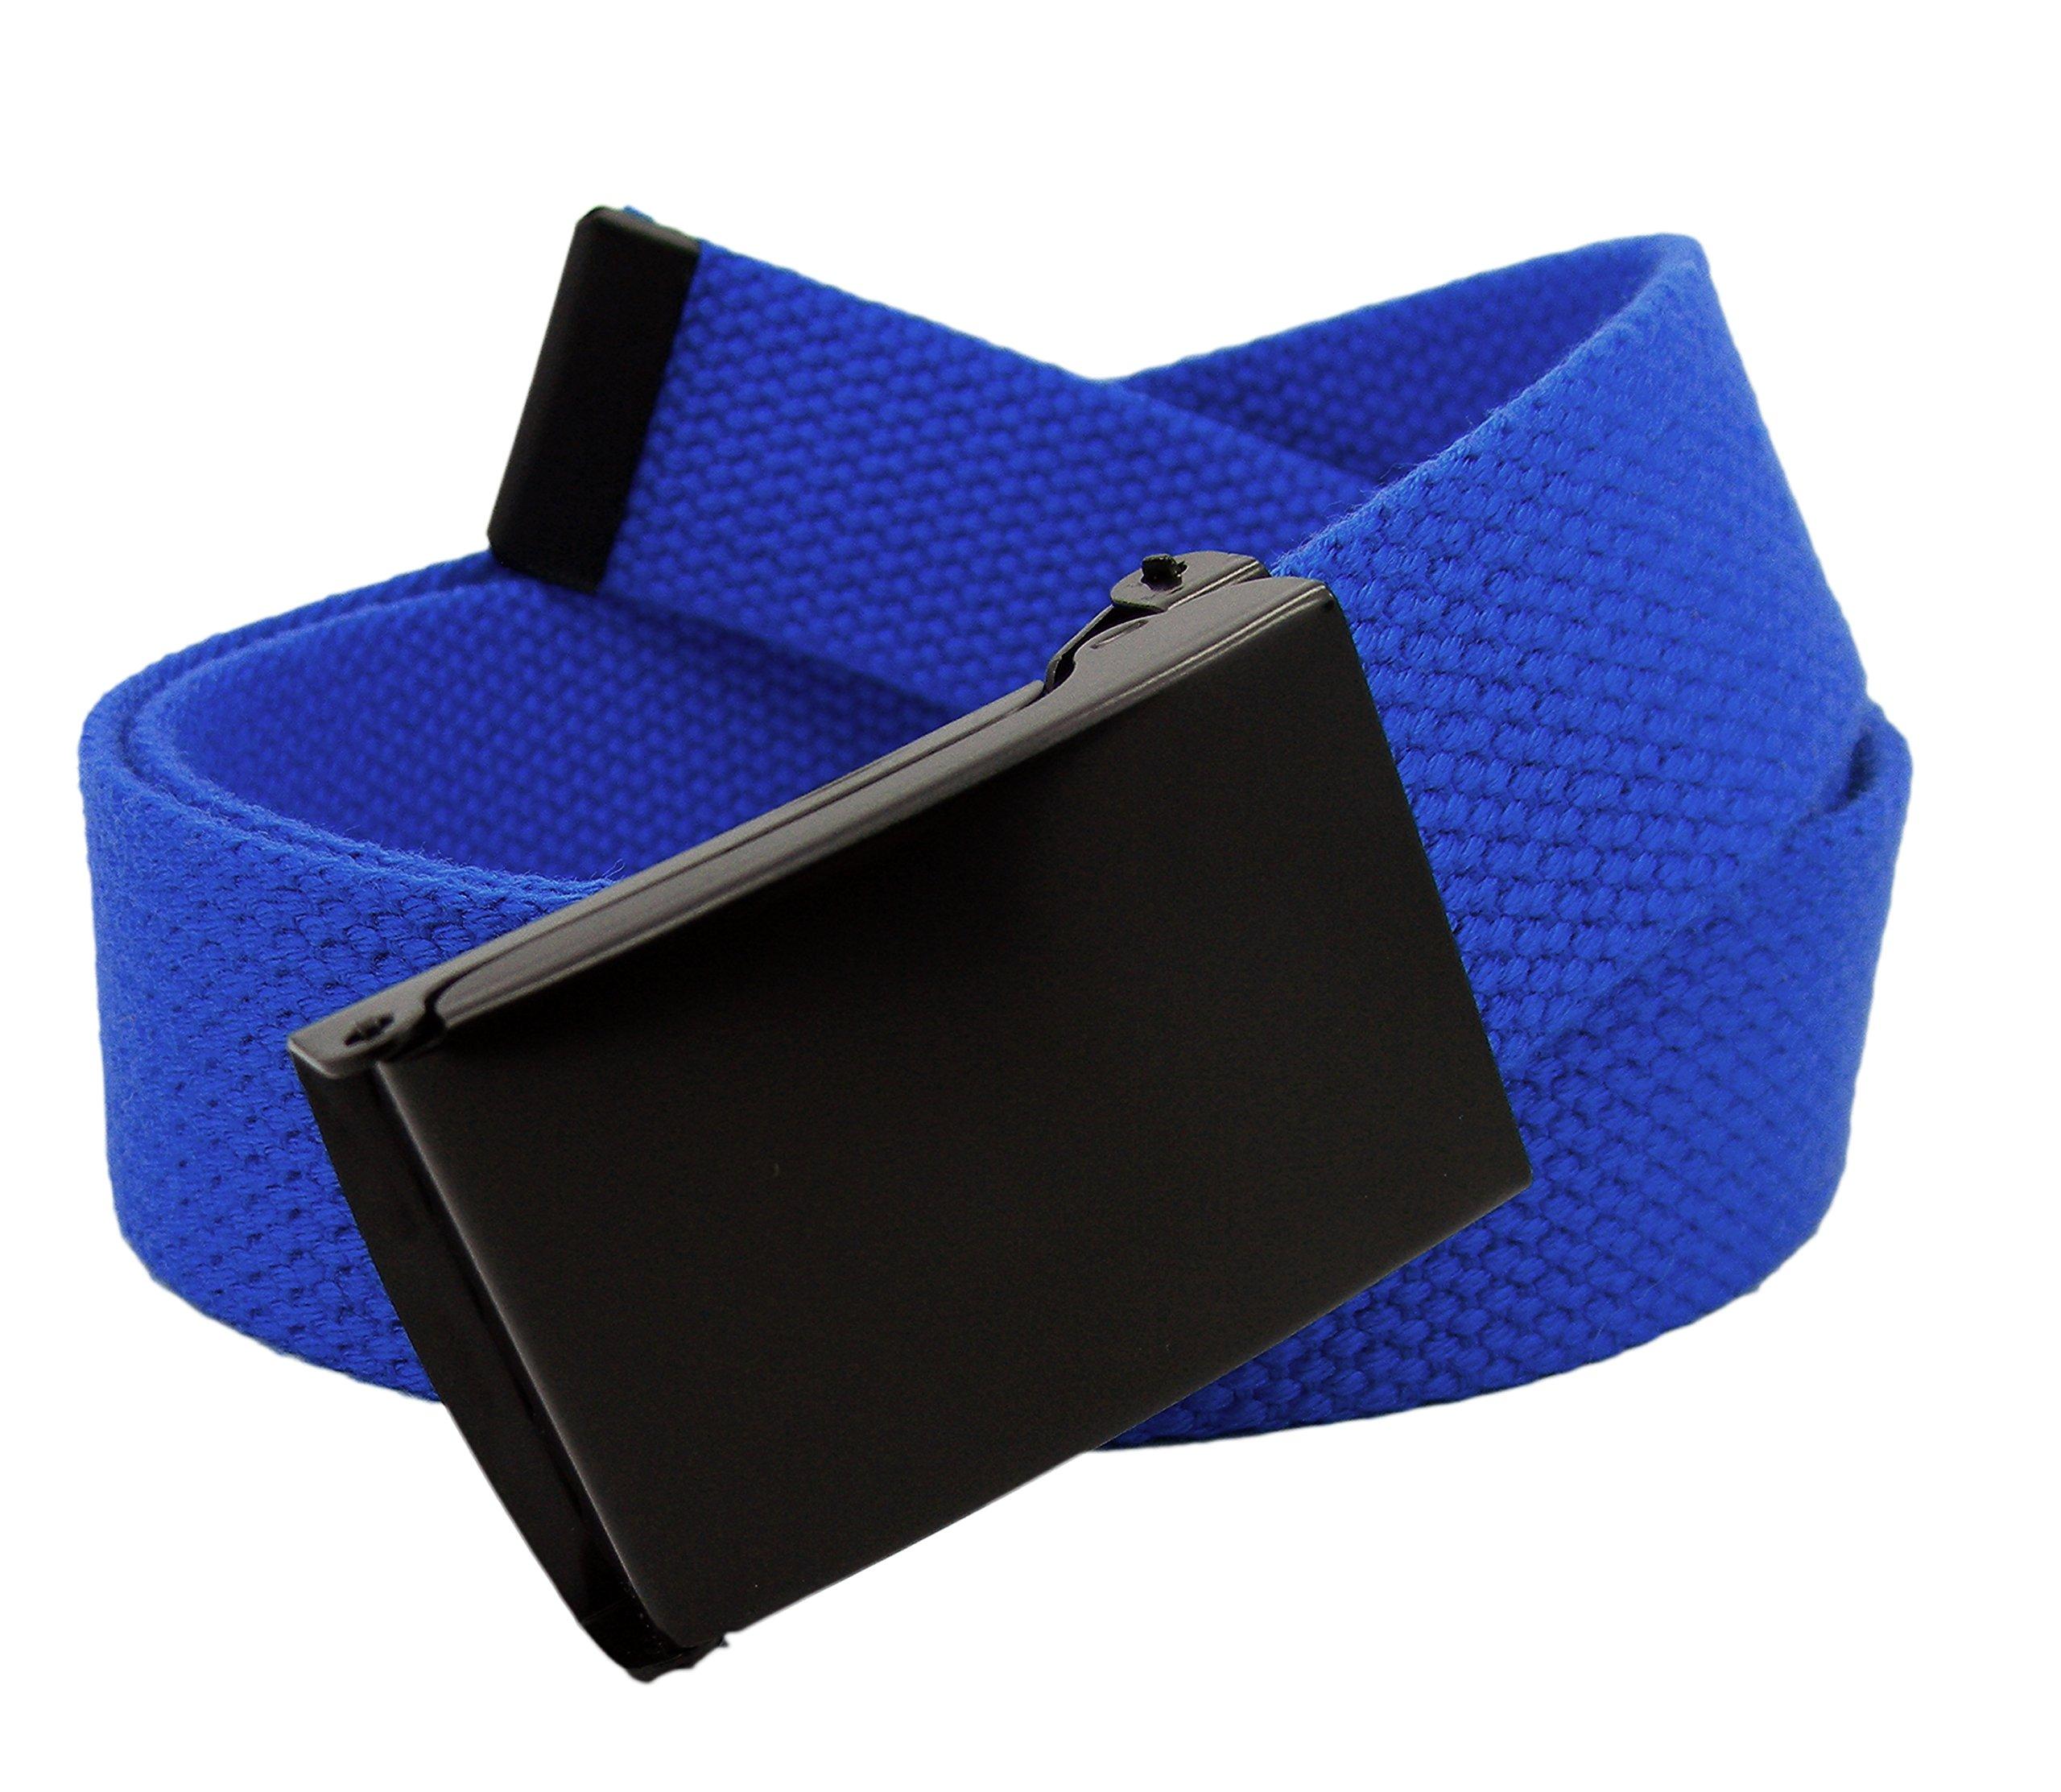 Boy's School Uniform Black Flip Top Military Belt Buckle with Canvas Web Belt Small Tardis Blue